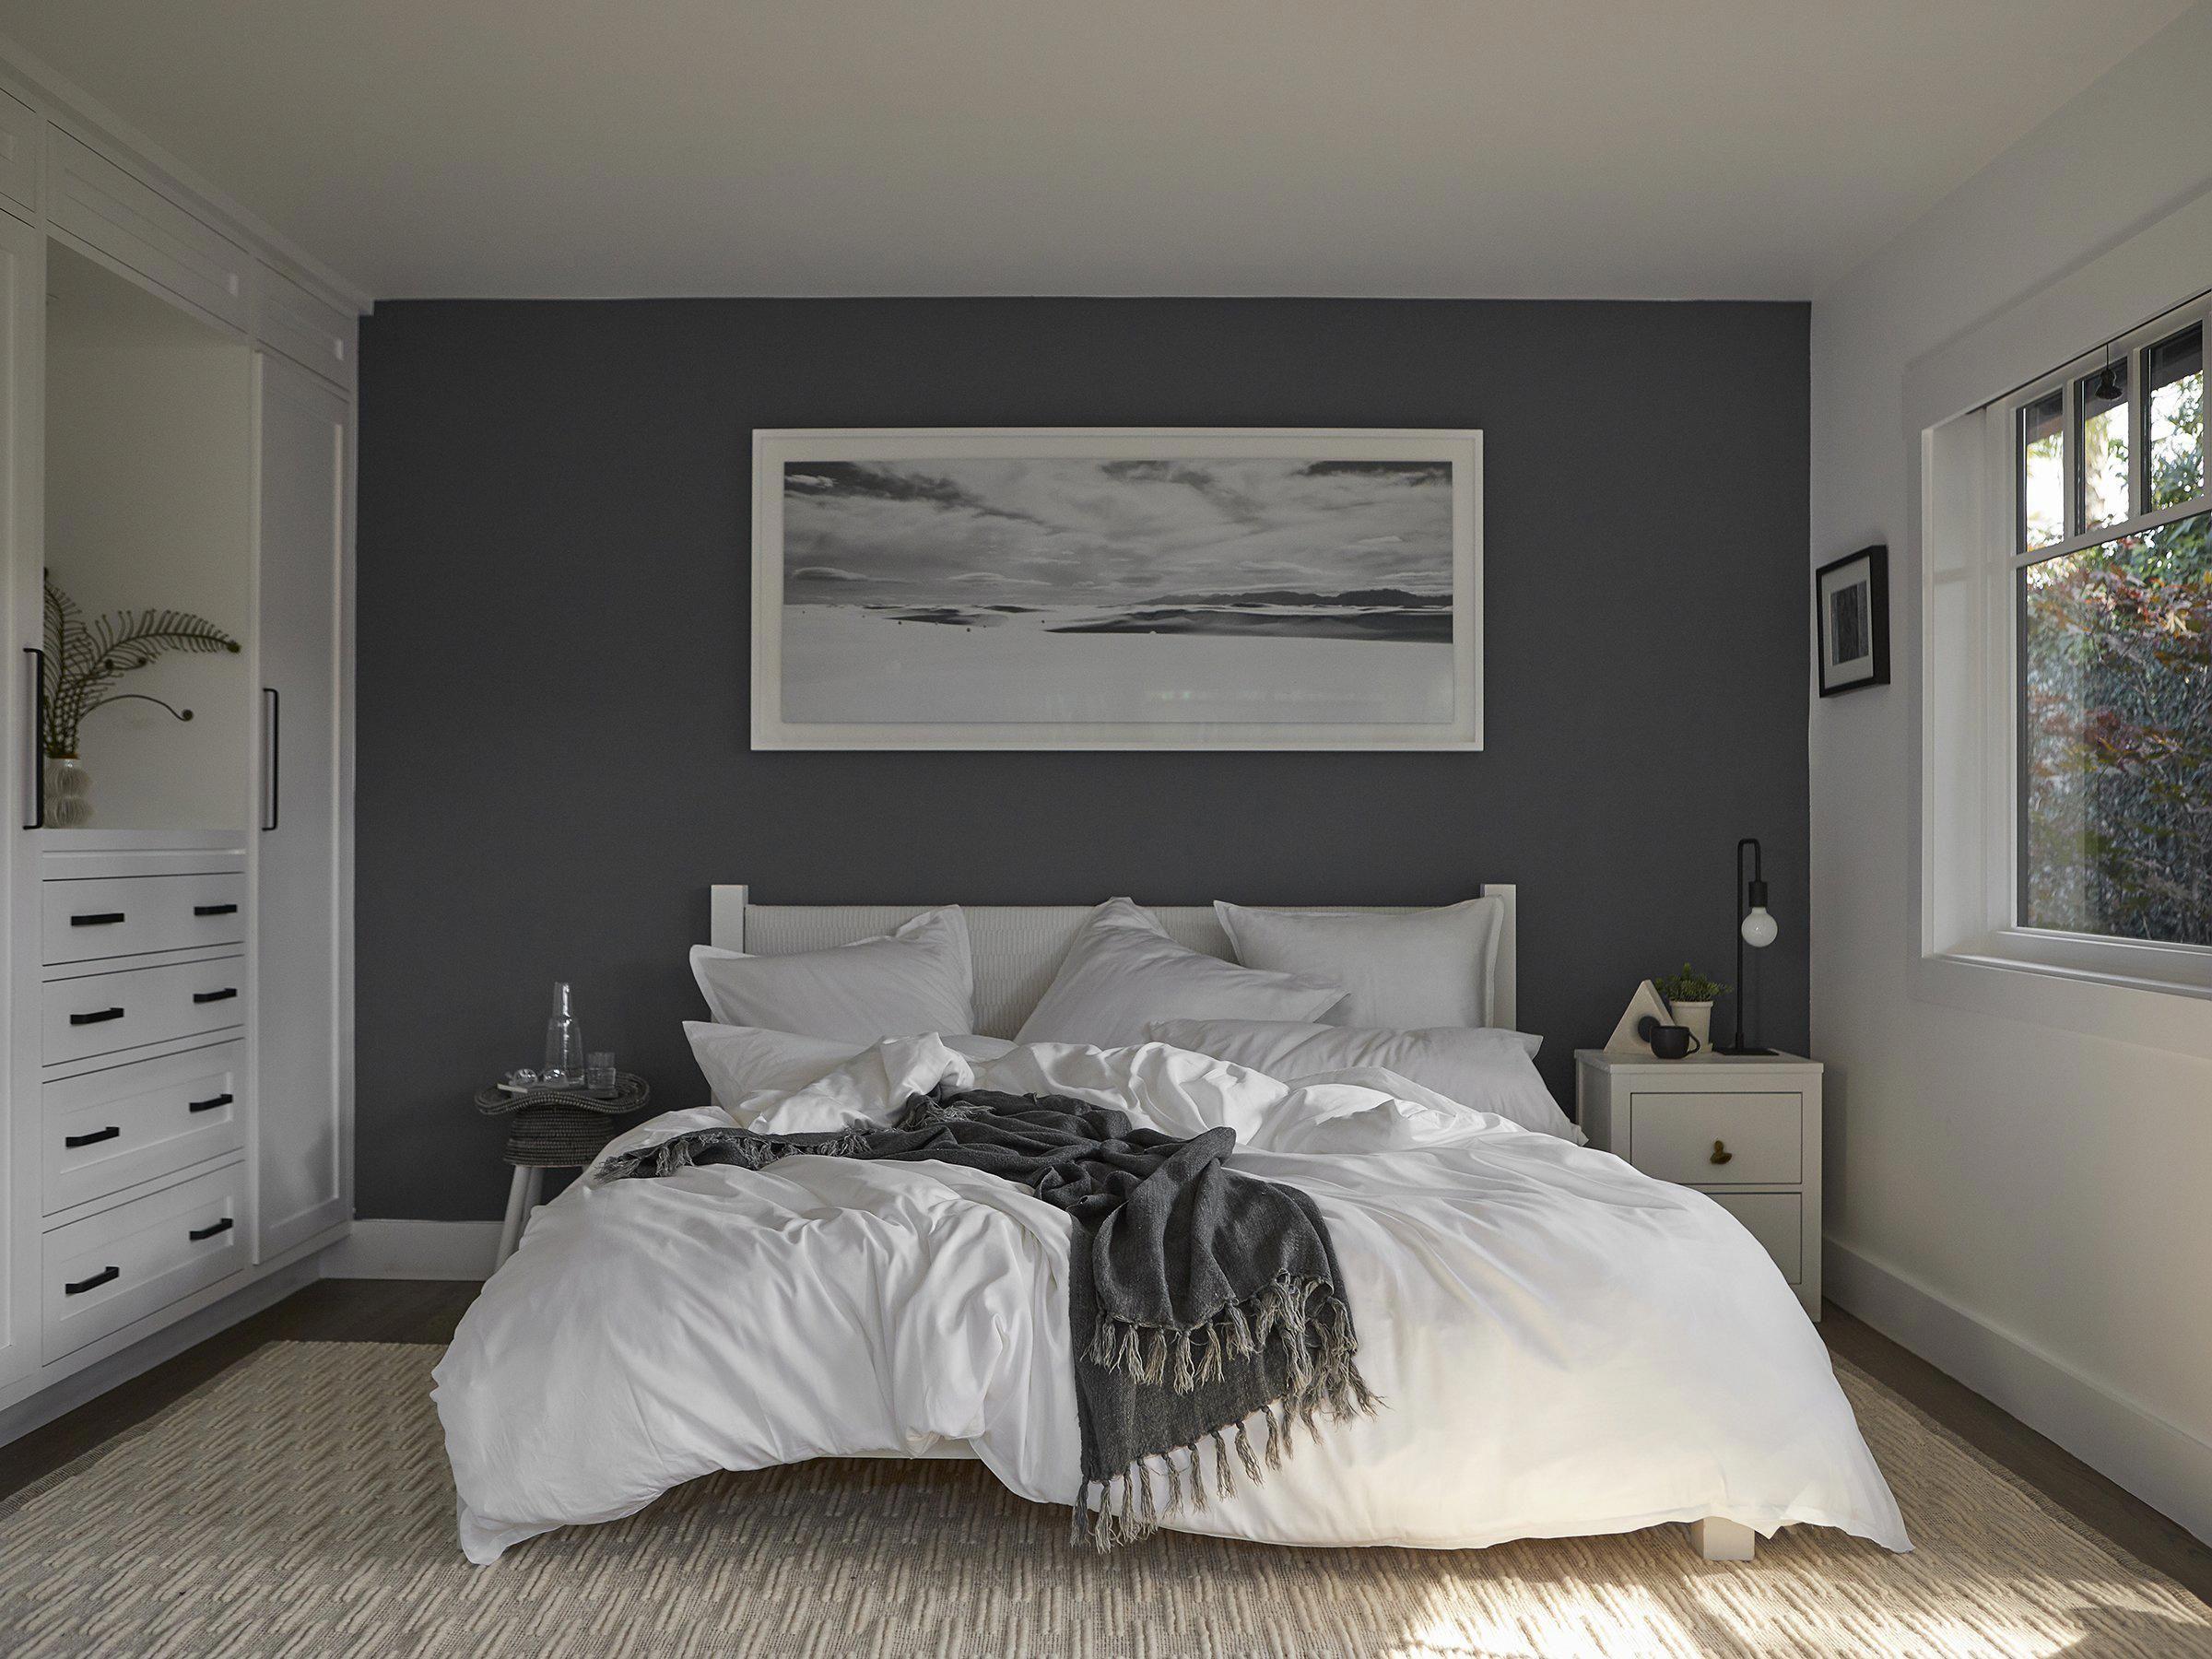 Textured Wool Rug In 2020 Home Decor Bedroom Bedroom Wall